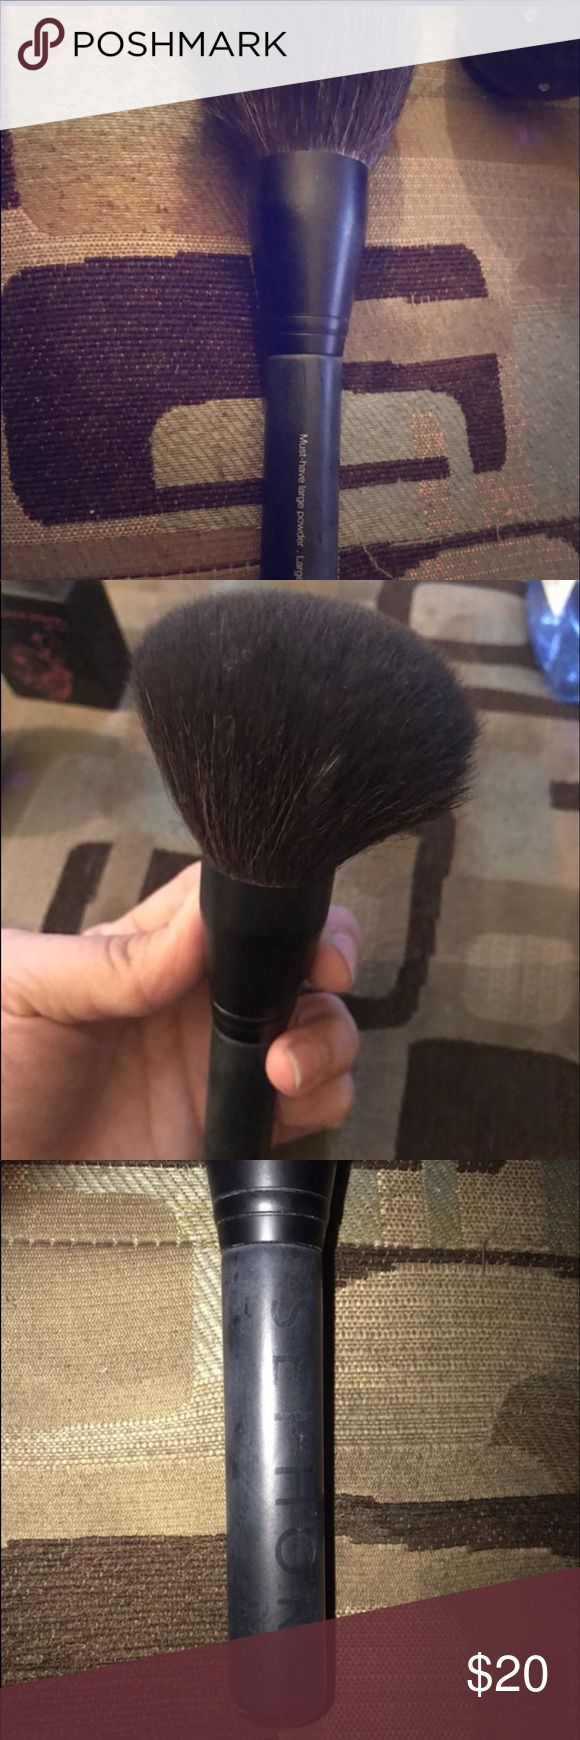 Sephora Must Have Powder Brush Practically new Sephora Makeup Brushes & Tools